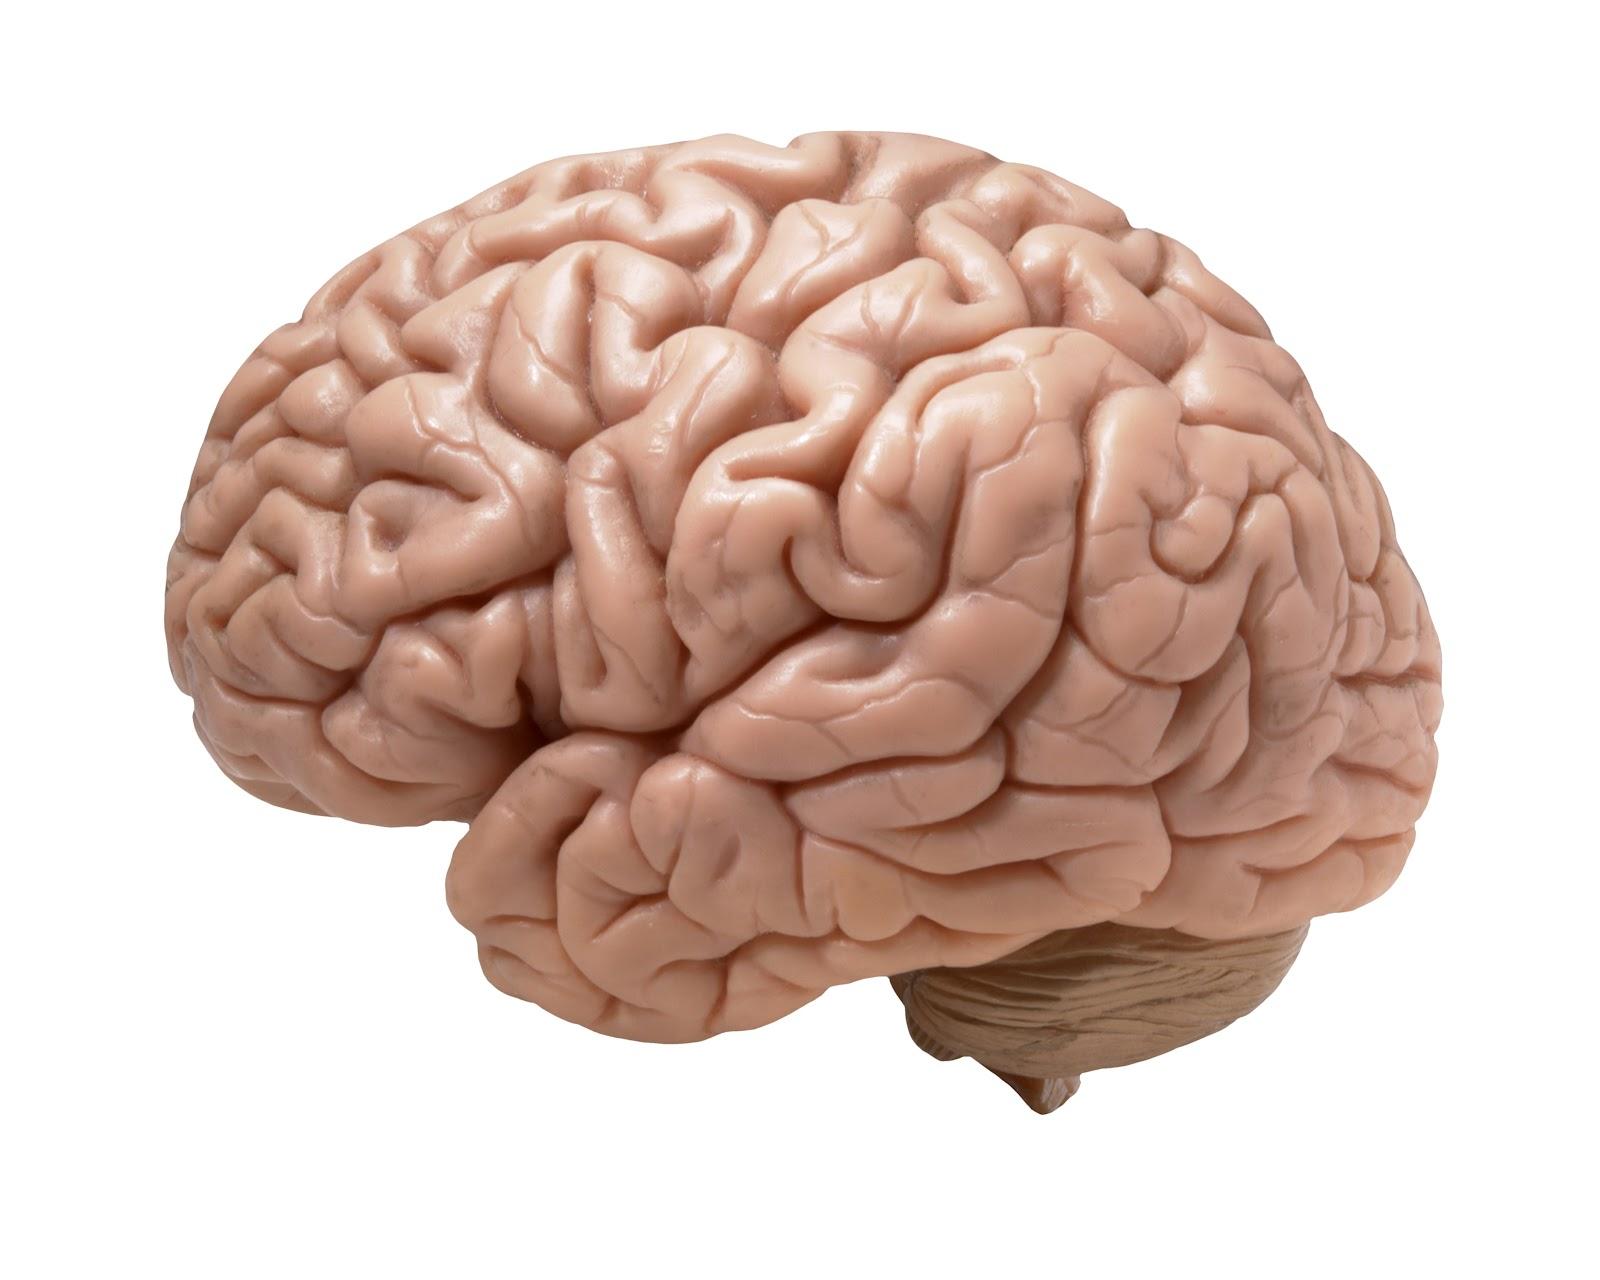 Cérebro humano - o sistema nervoso está quase todo próximo ou fazendo parte do cérebro.